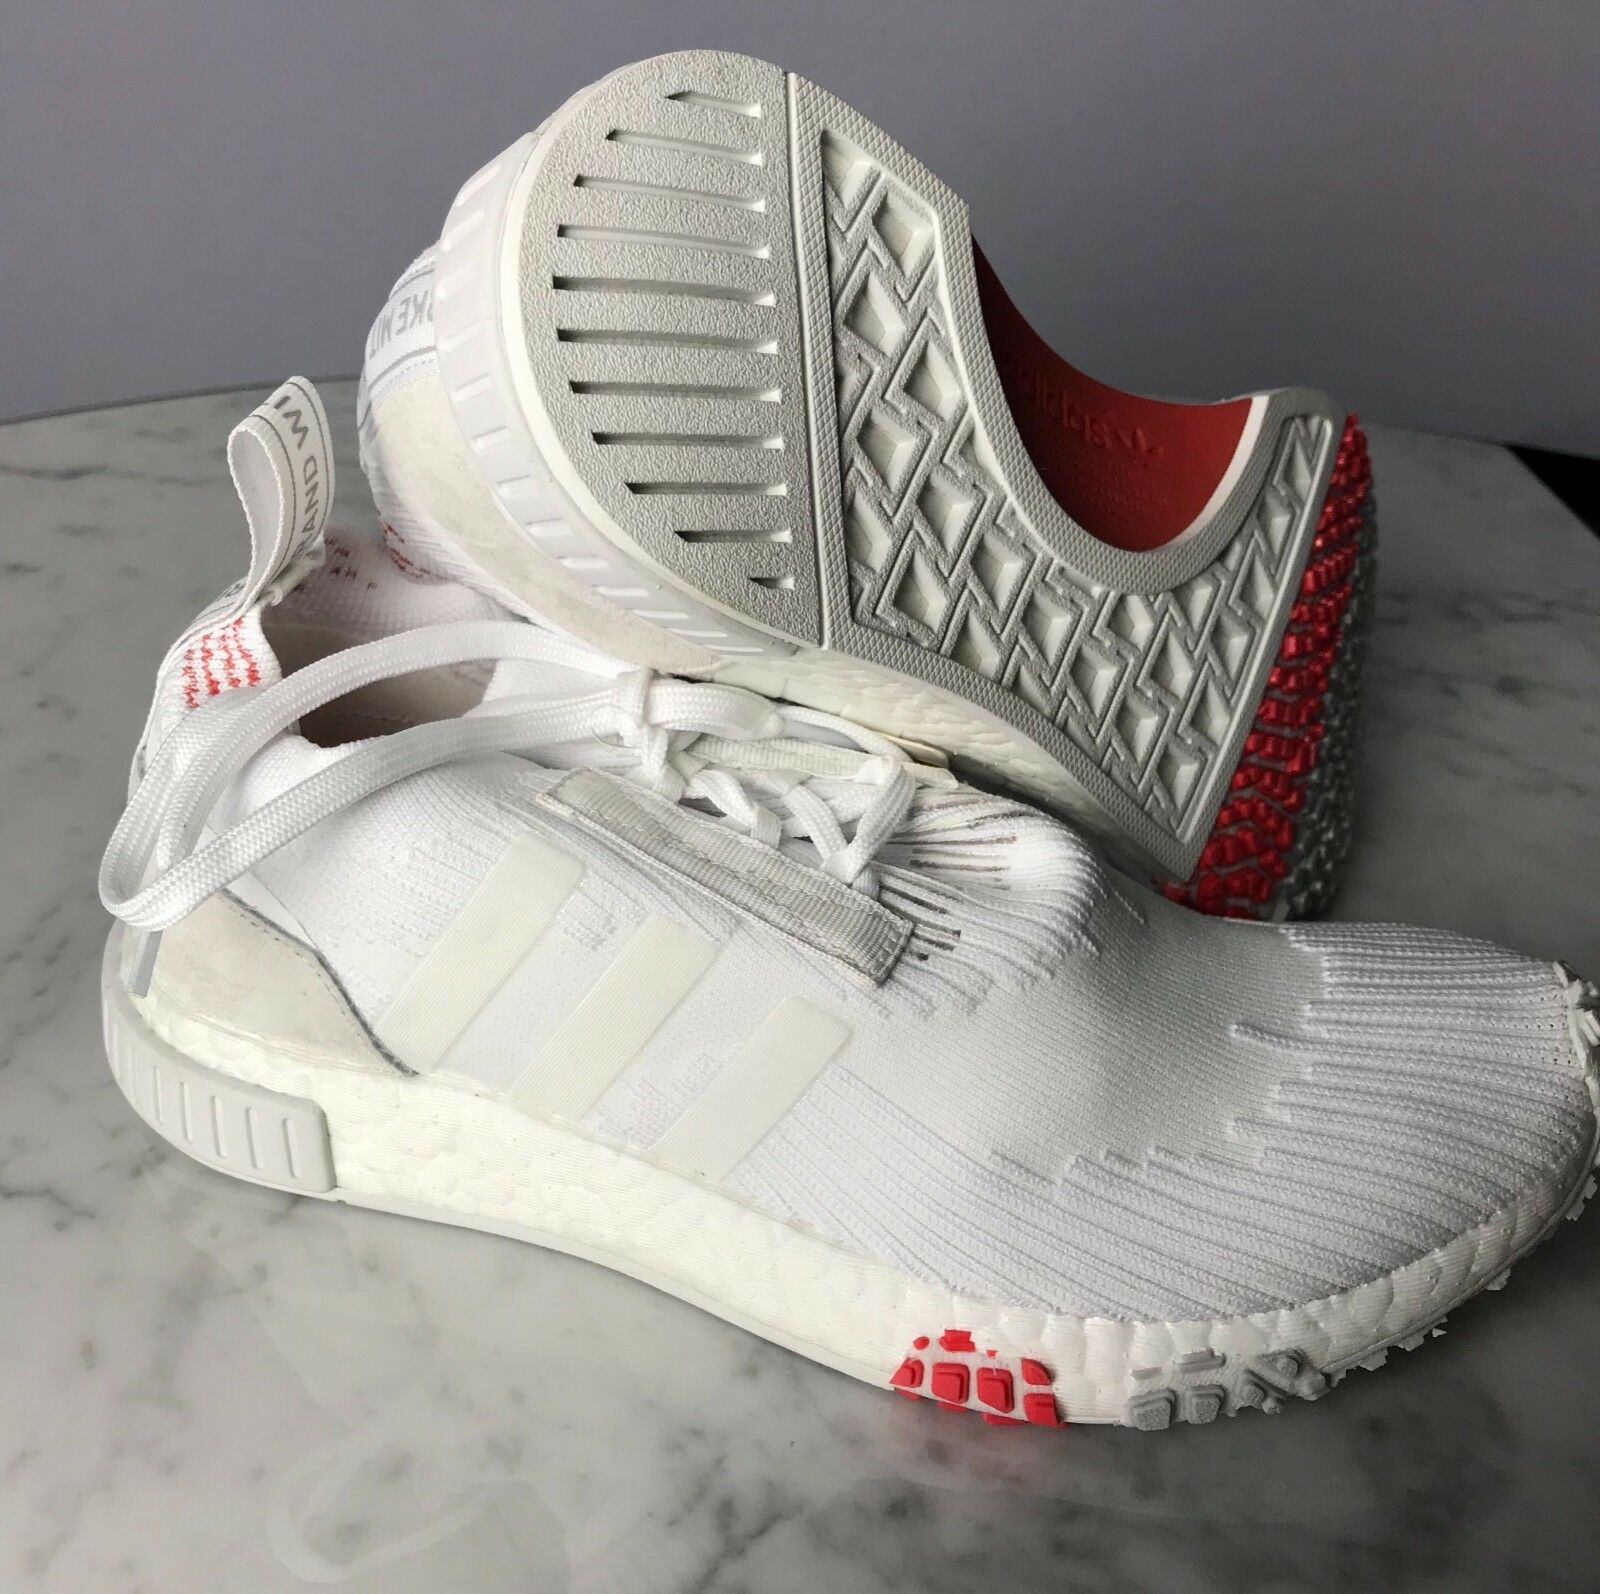 Adidas nmd / racer pk - ftwwht / nmd ftwwht / rascal - cq2033 - campione 2a4bc1